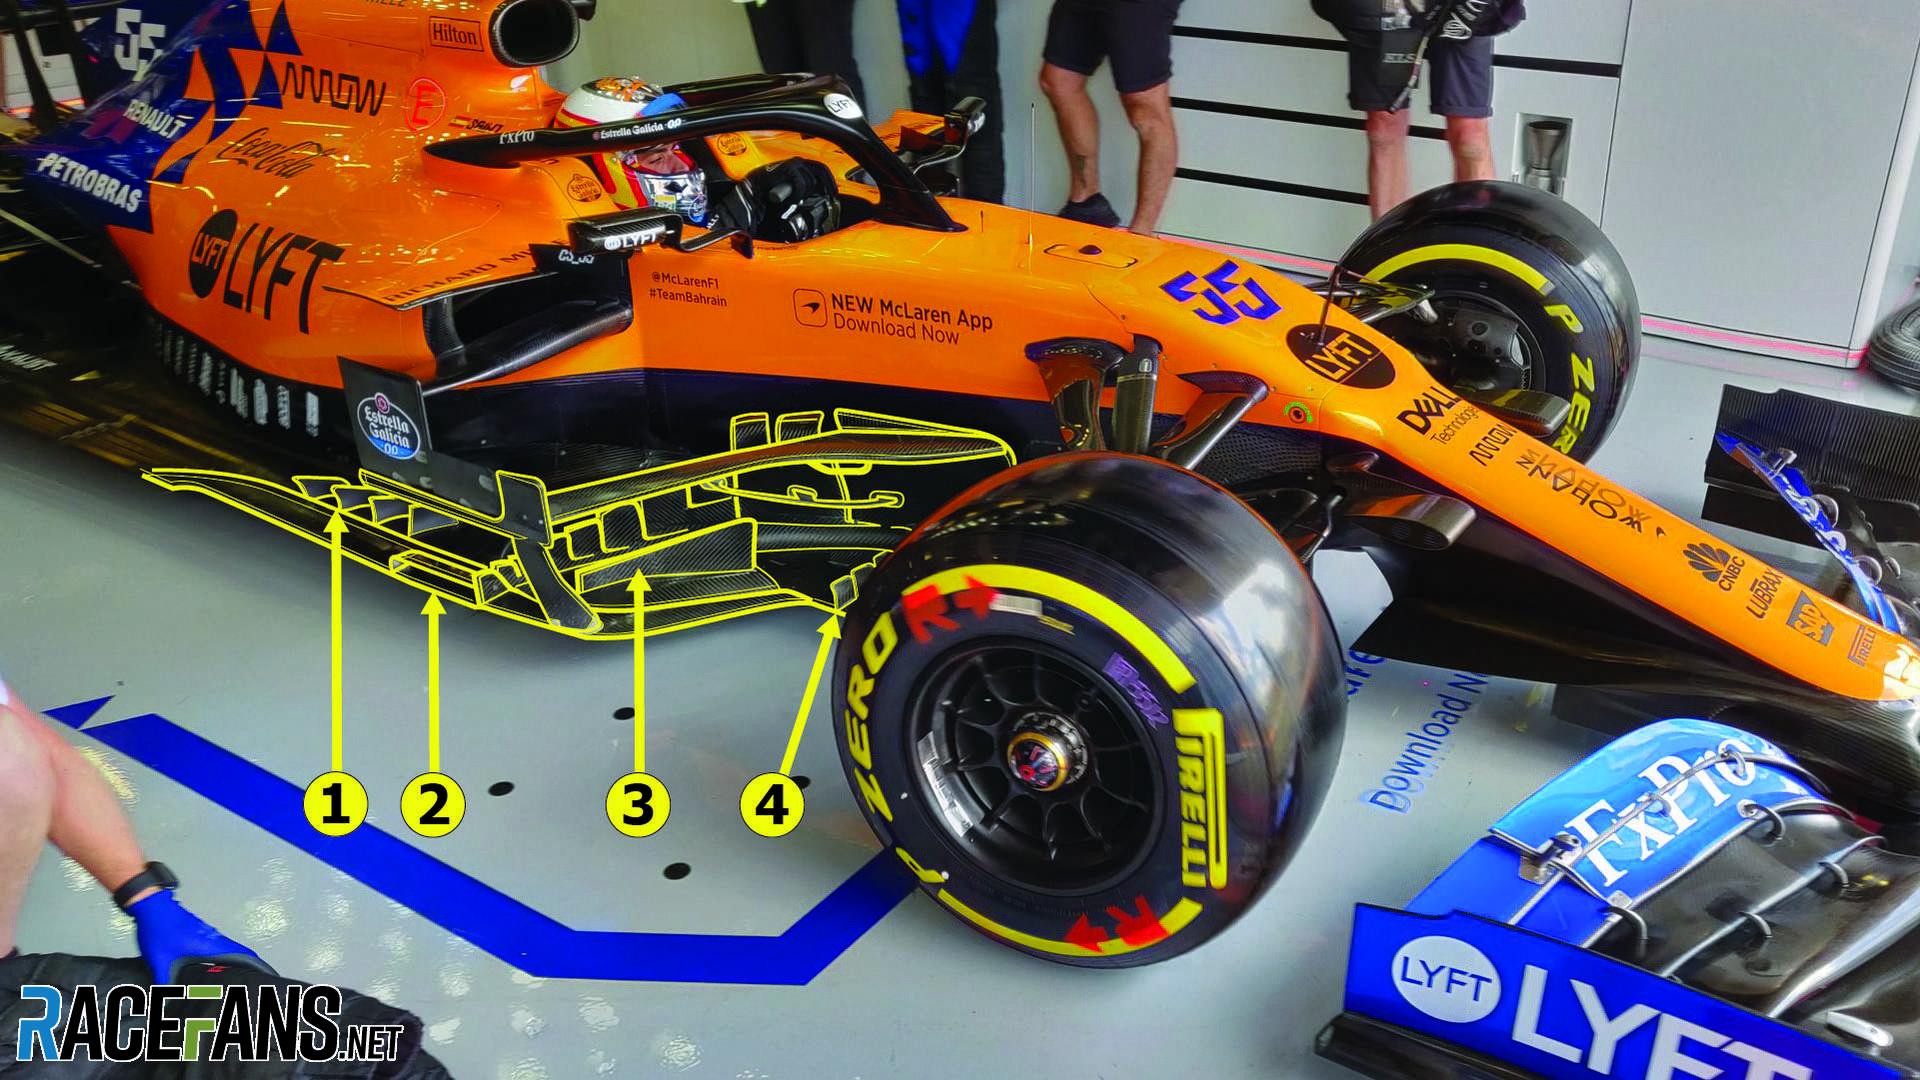 F1 Tech The Updates Helping Mclaren Pull Away From Renault Racefans